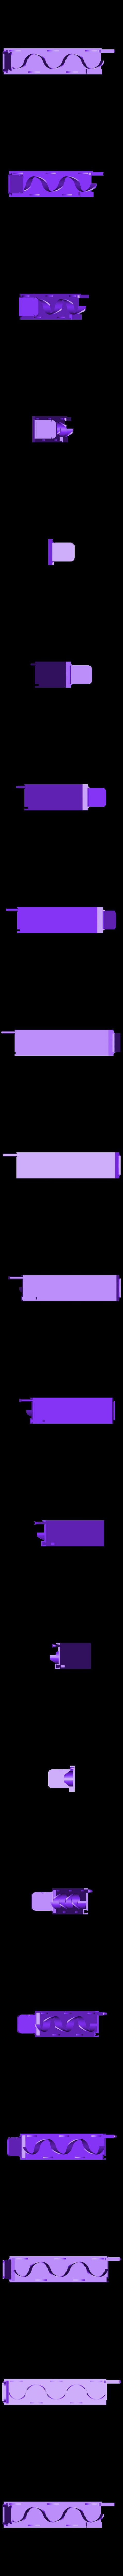 Nespresso_organizer_front.stl Download free STL file Nespresso pod organizer • 3D printer design, mschiller